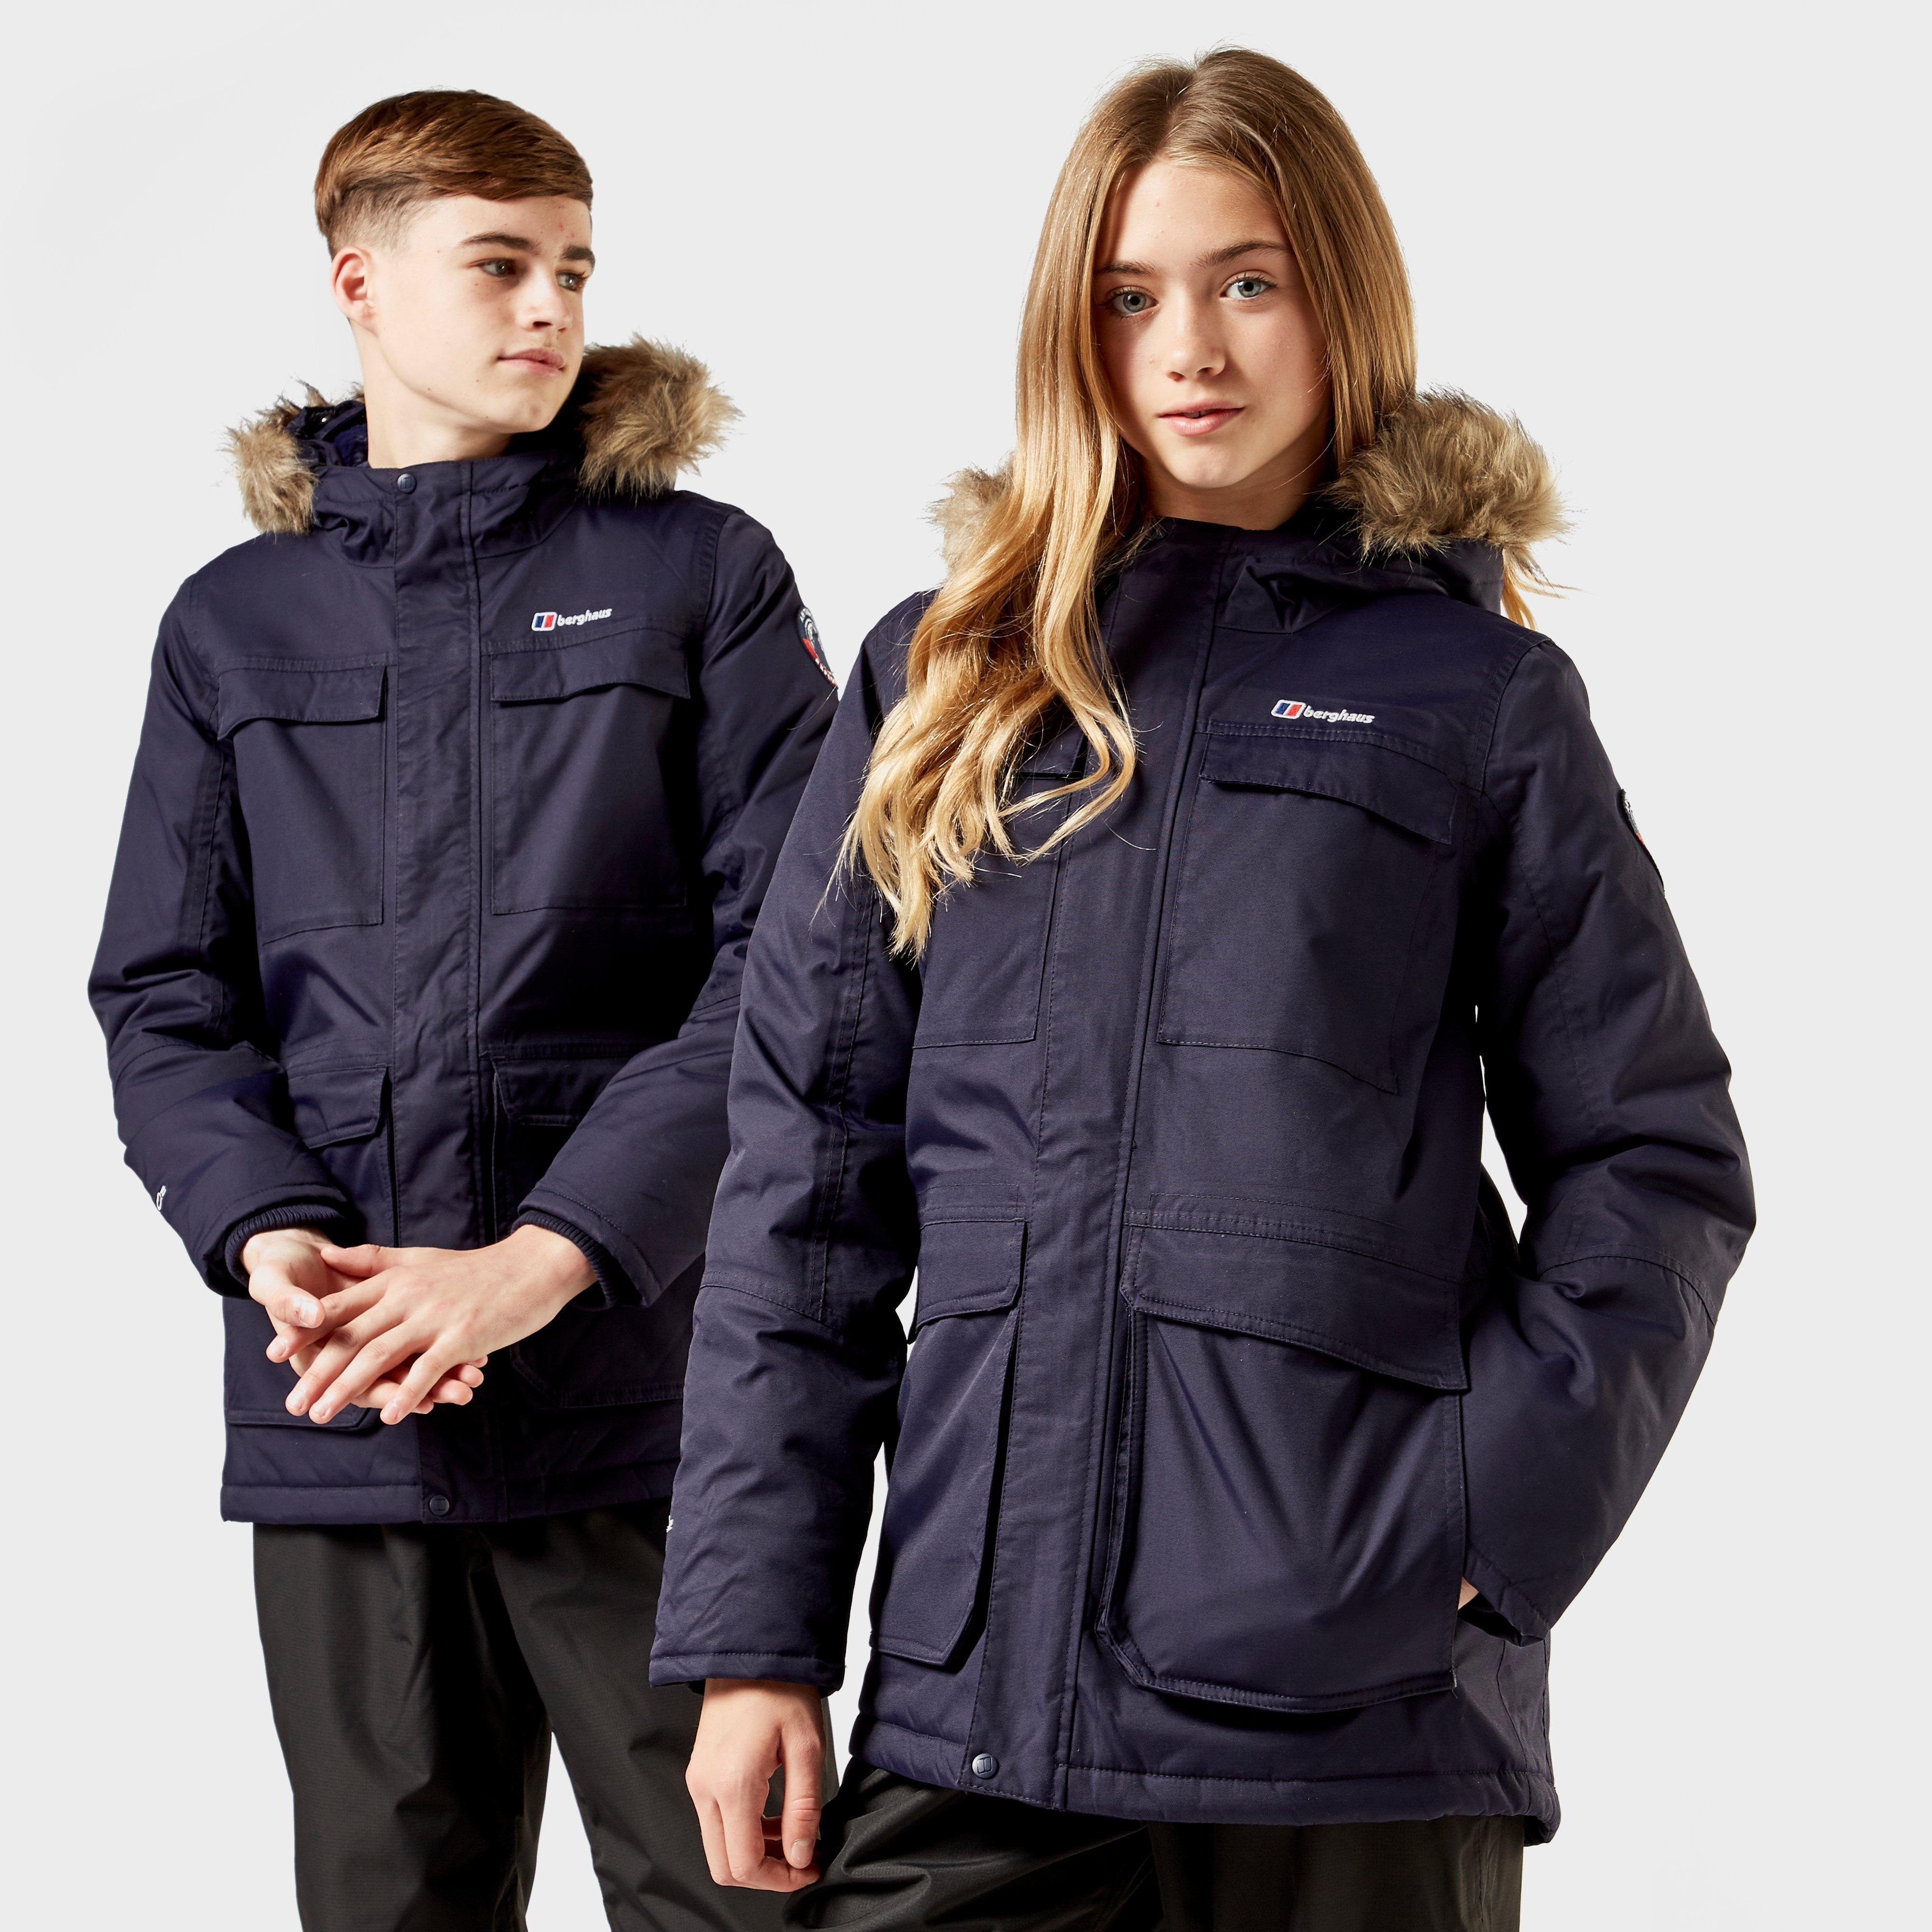 berghaus kids kids clothing boys clothing jackets coats #2: bl a